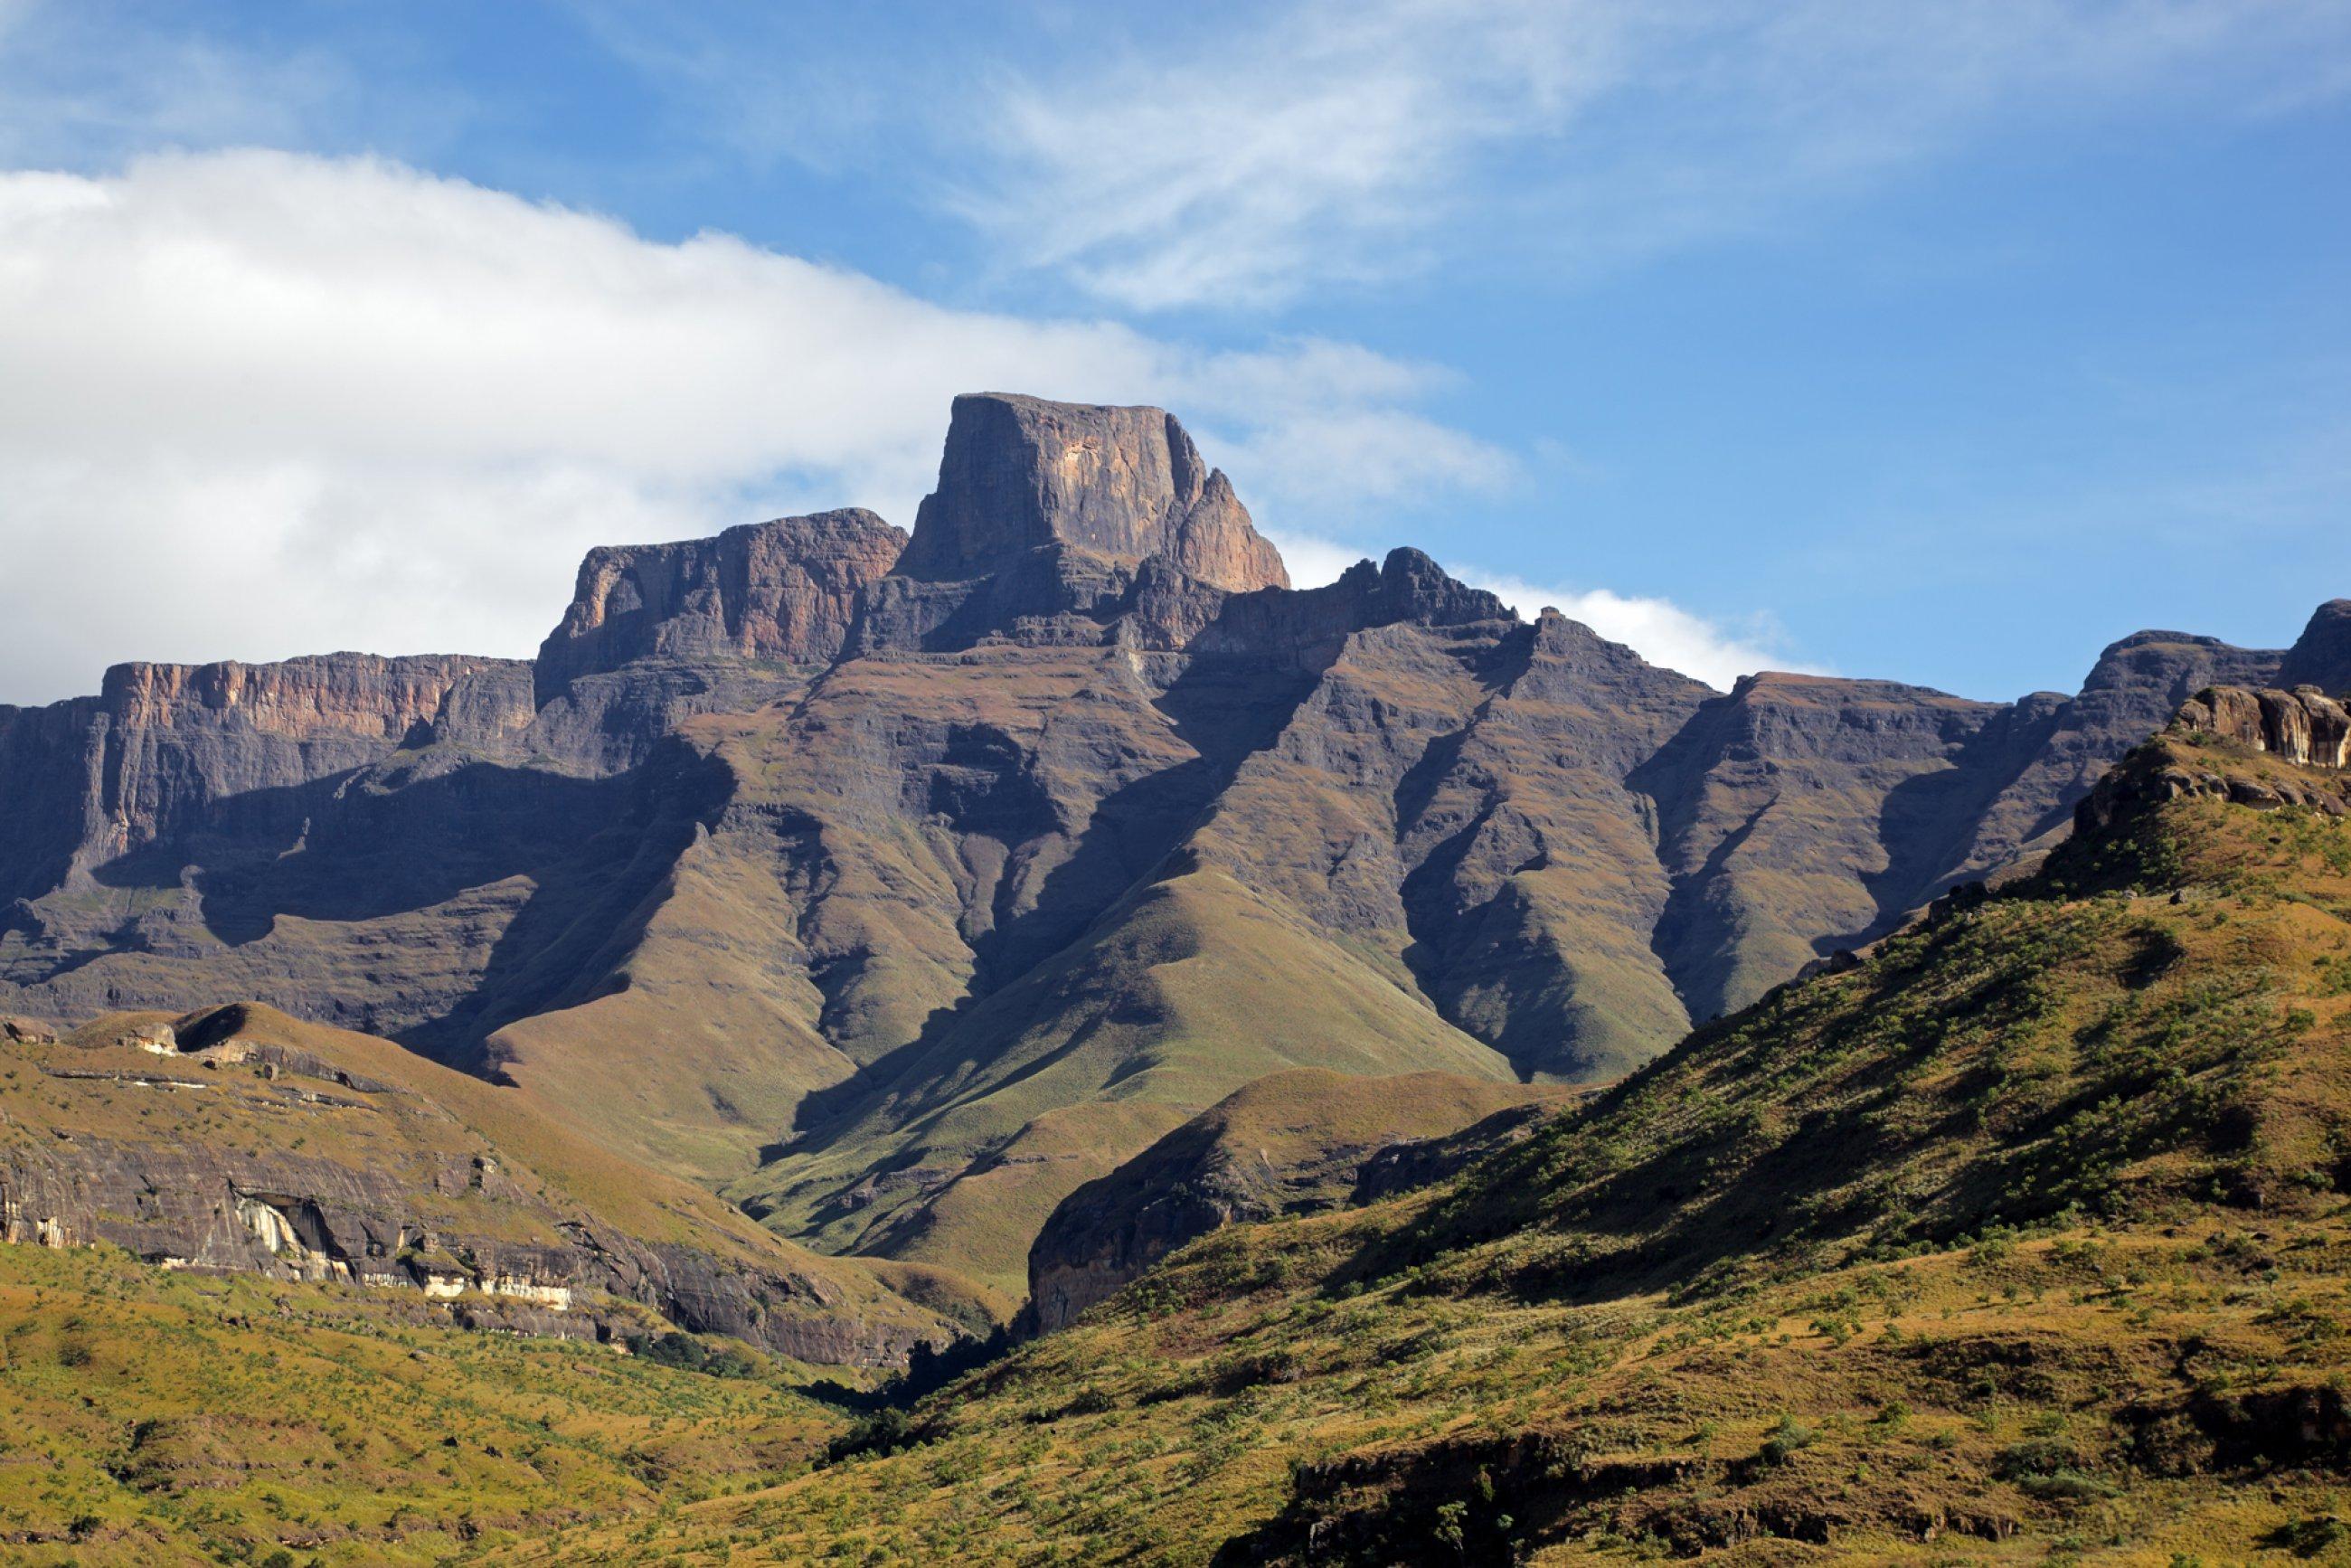 https://bubo.sk/uploads/galleries/7302/jar-sentinal-peak-in-the-amphiteater-of-the-drakensberg-mountains-royal-natal-national-park.jpg